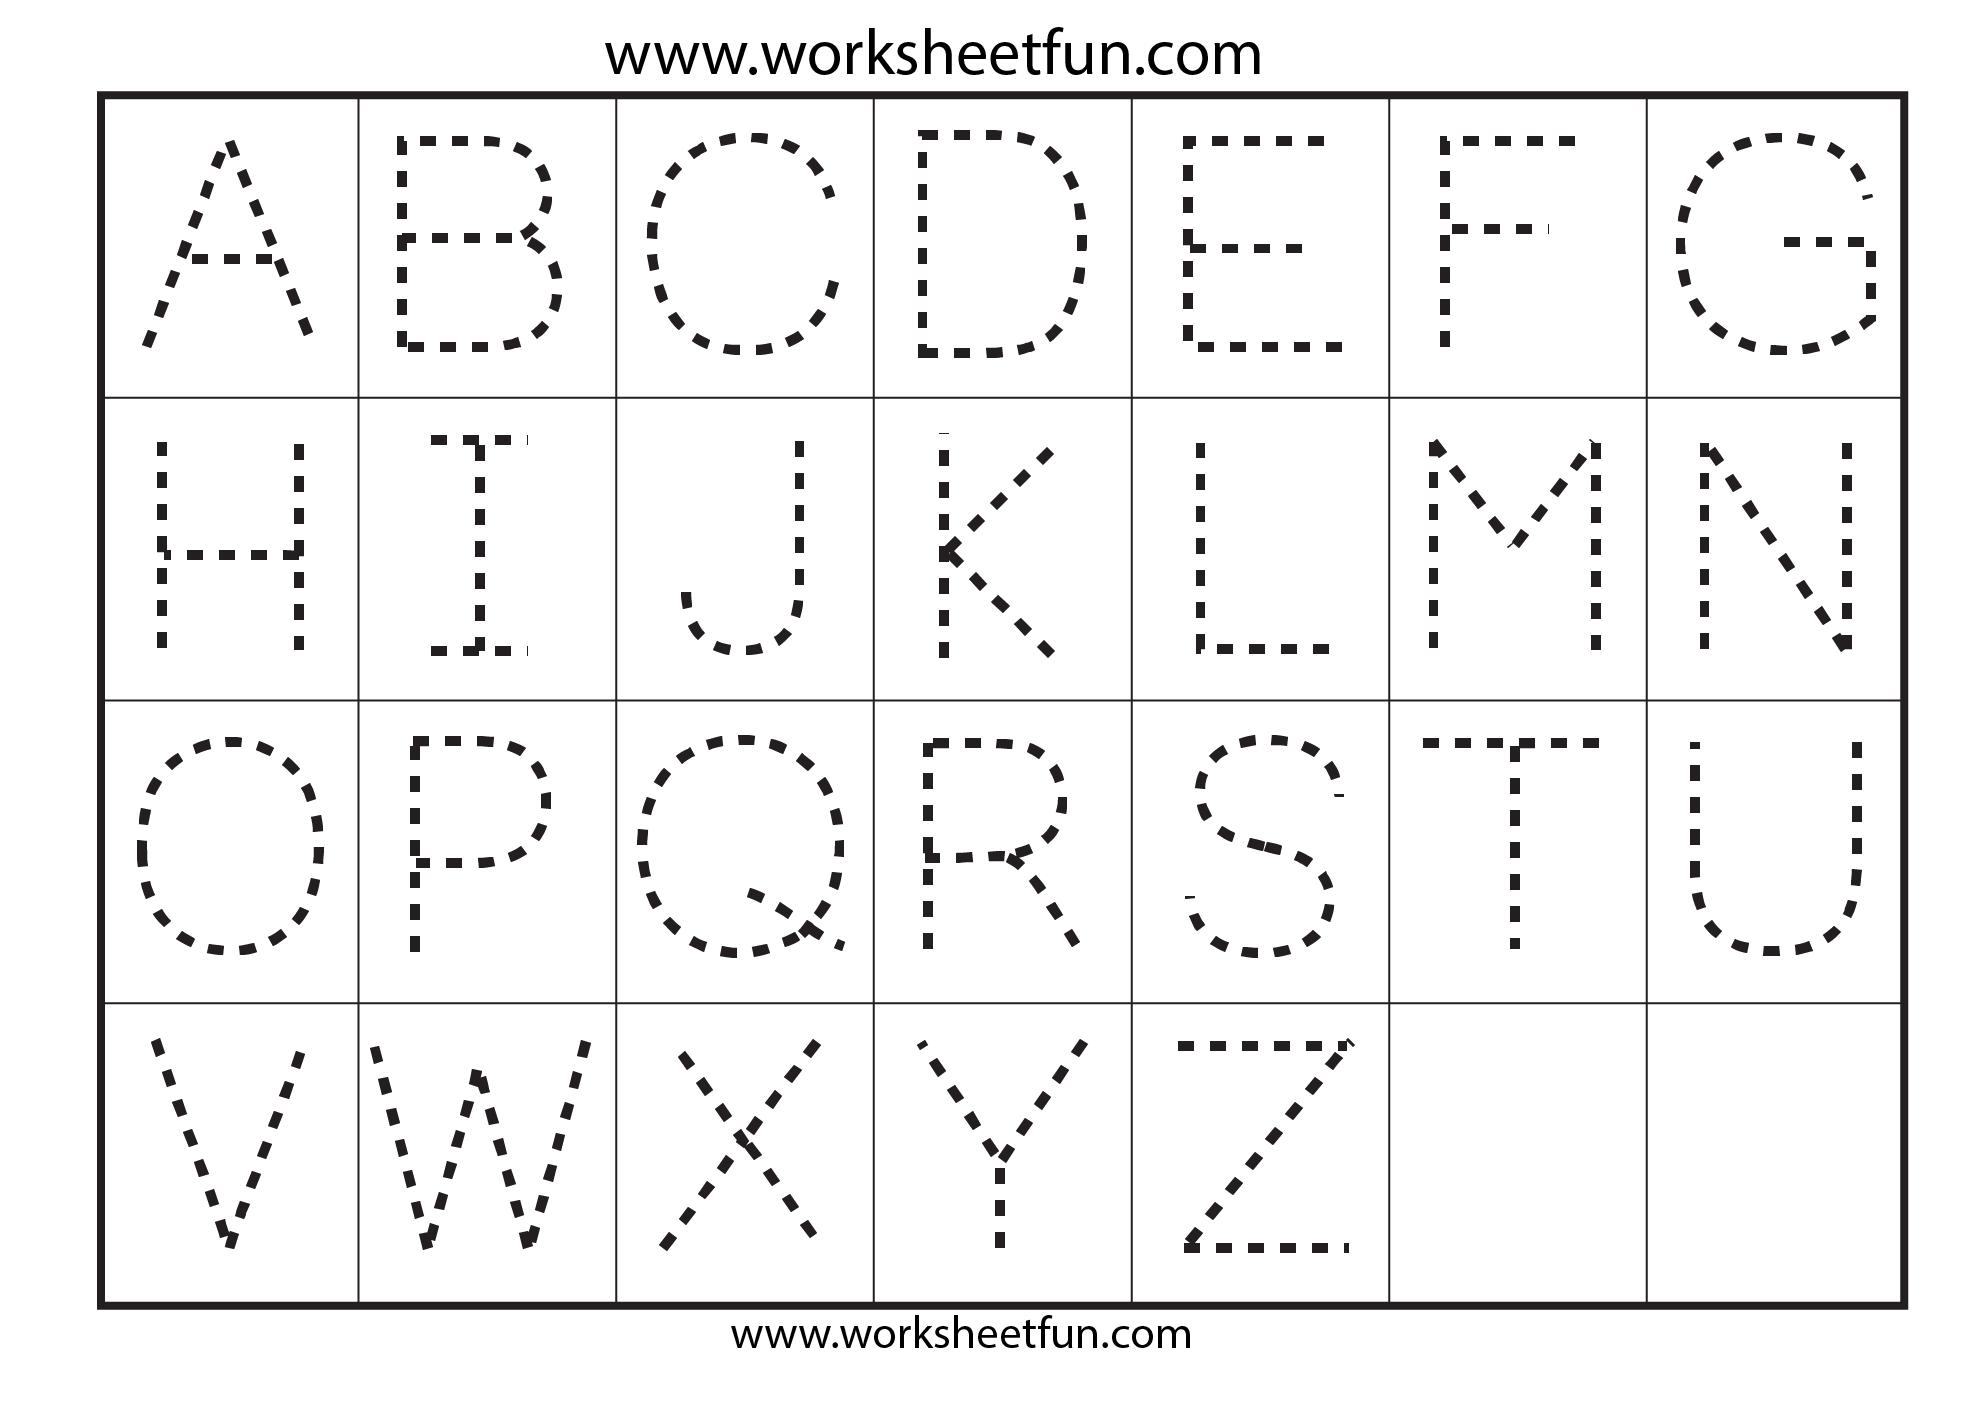 Preschool Worksheets Alphabet Tracing Letter A | Printable intended for Abc Alphabet Tracing Letters